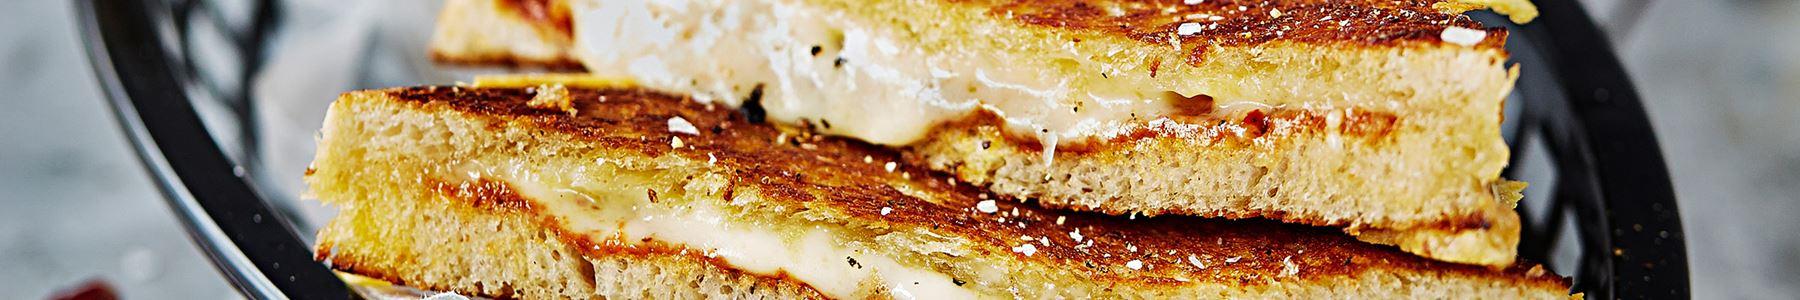 Persika + Toast + Stekt